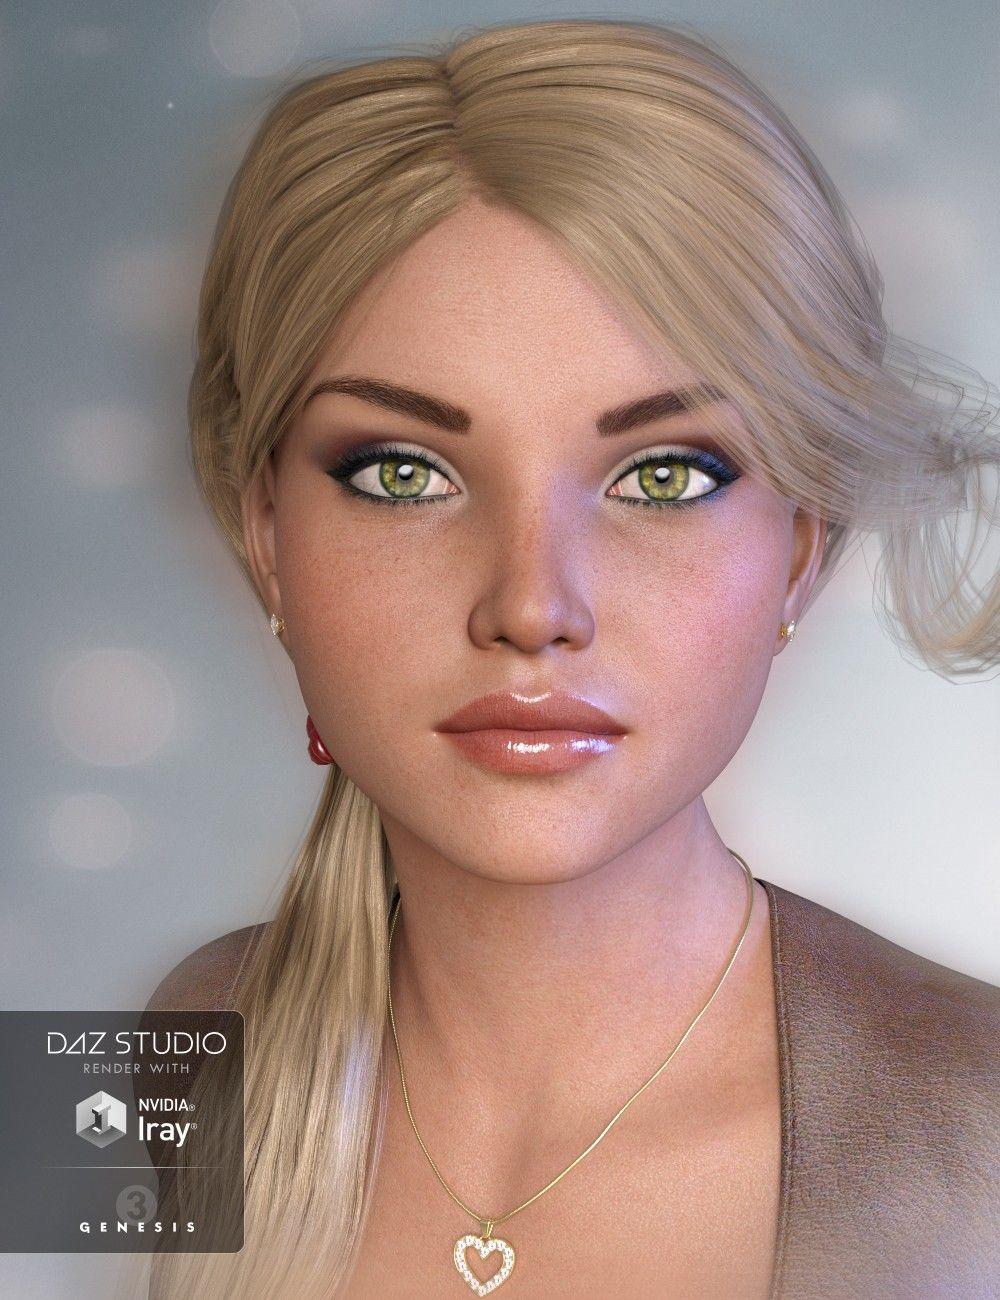 Gdn3a Eliza For Genesis 3 Female Models And By Daz